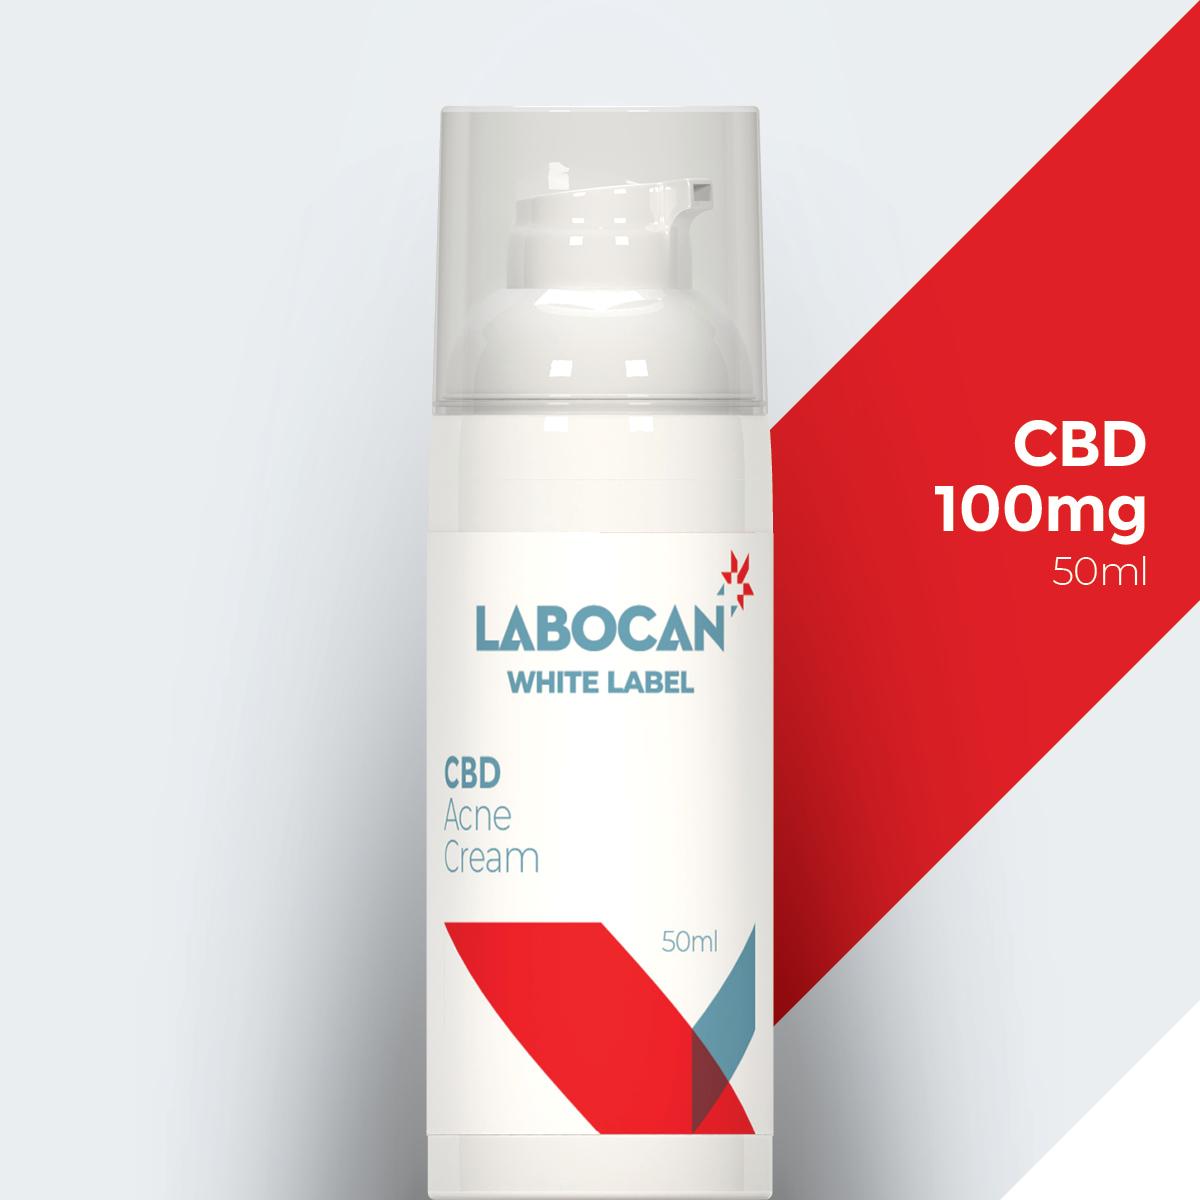 Labocan White Label CBD Akne-Creme